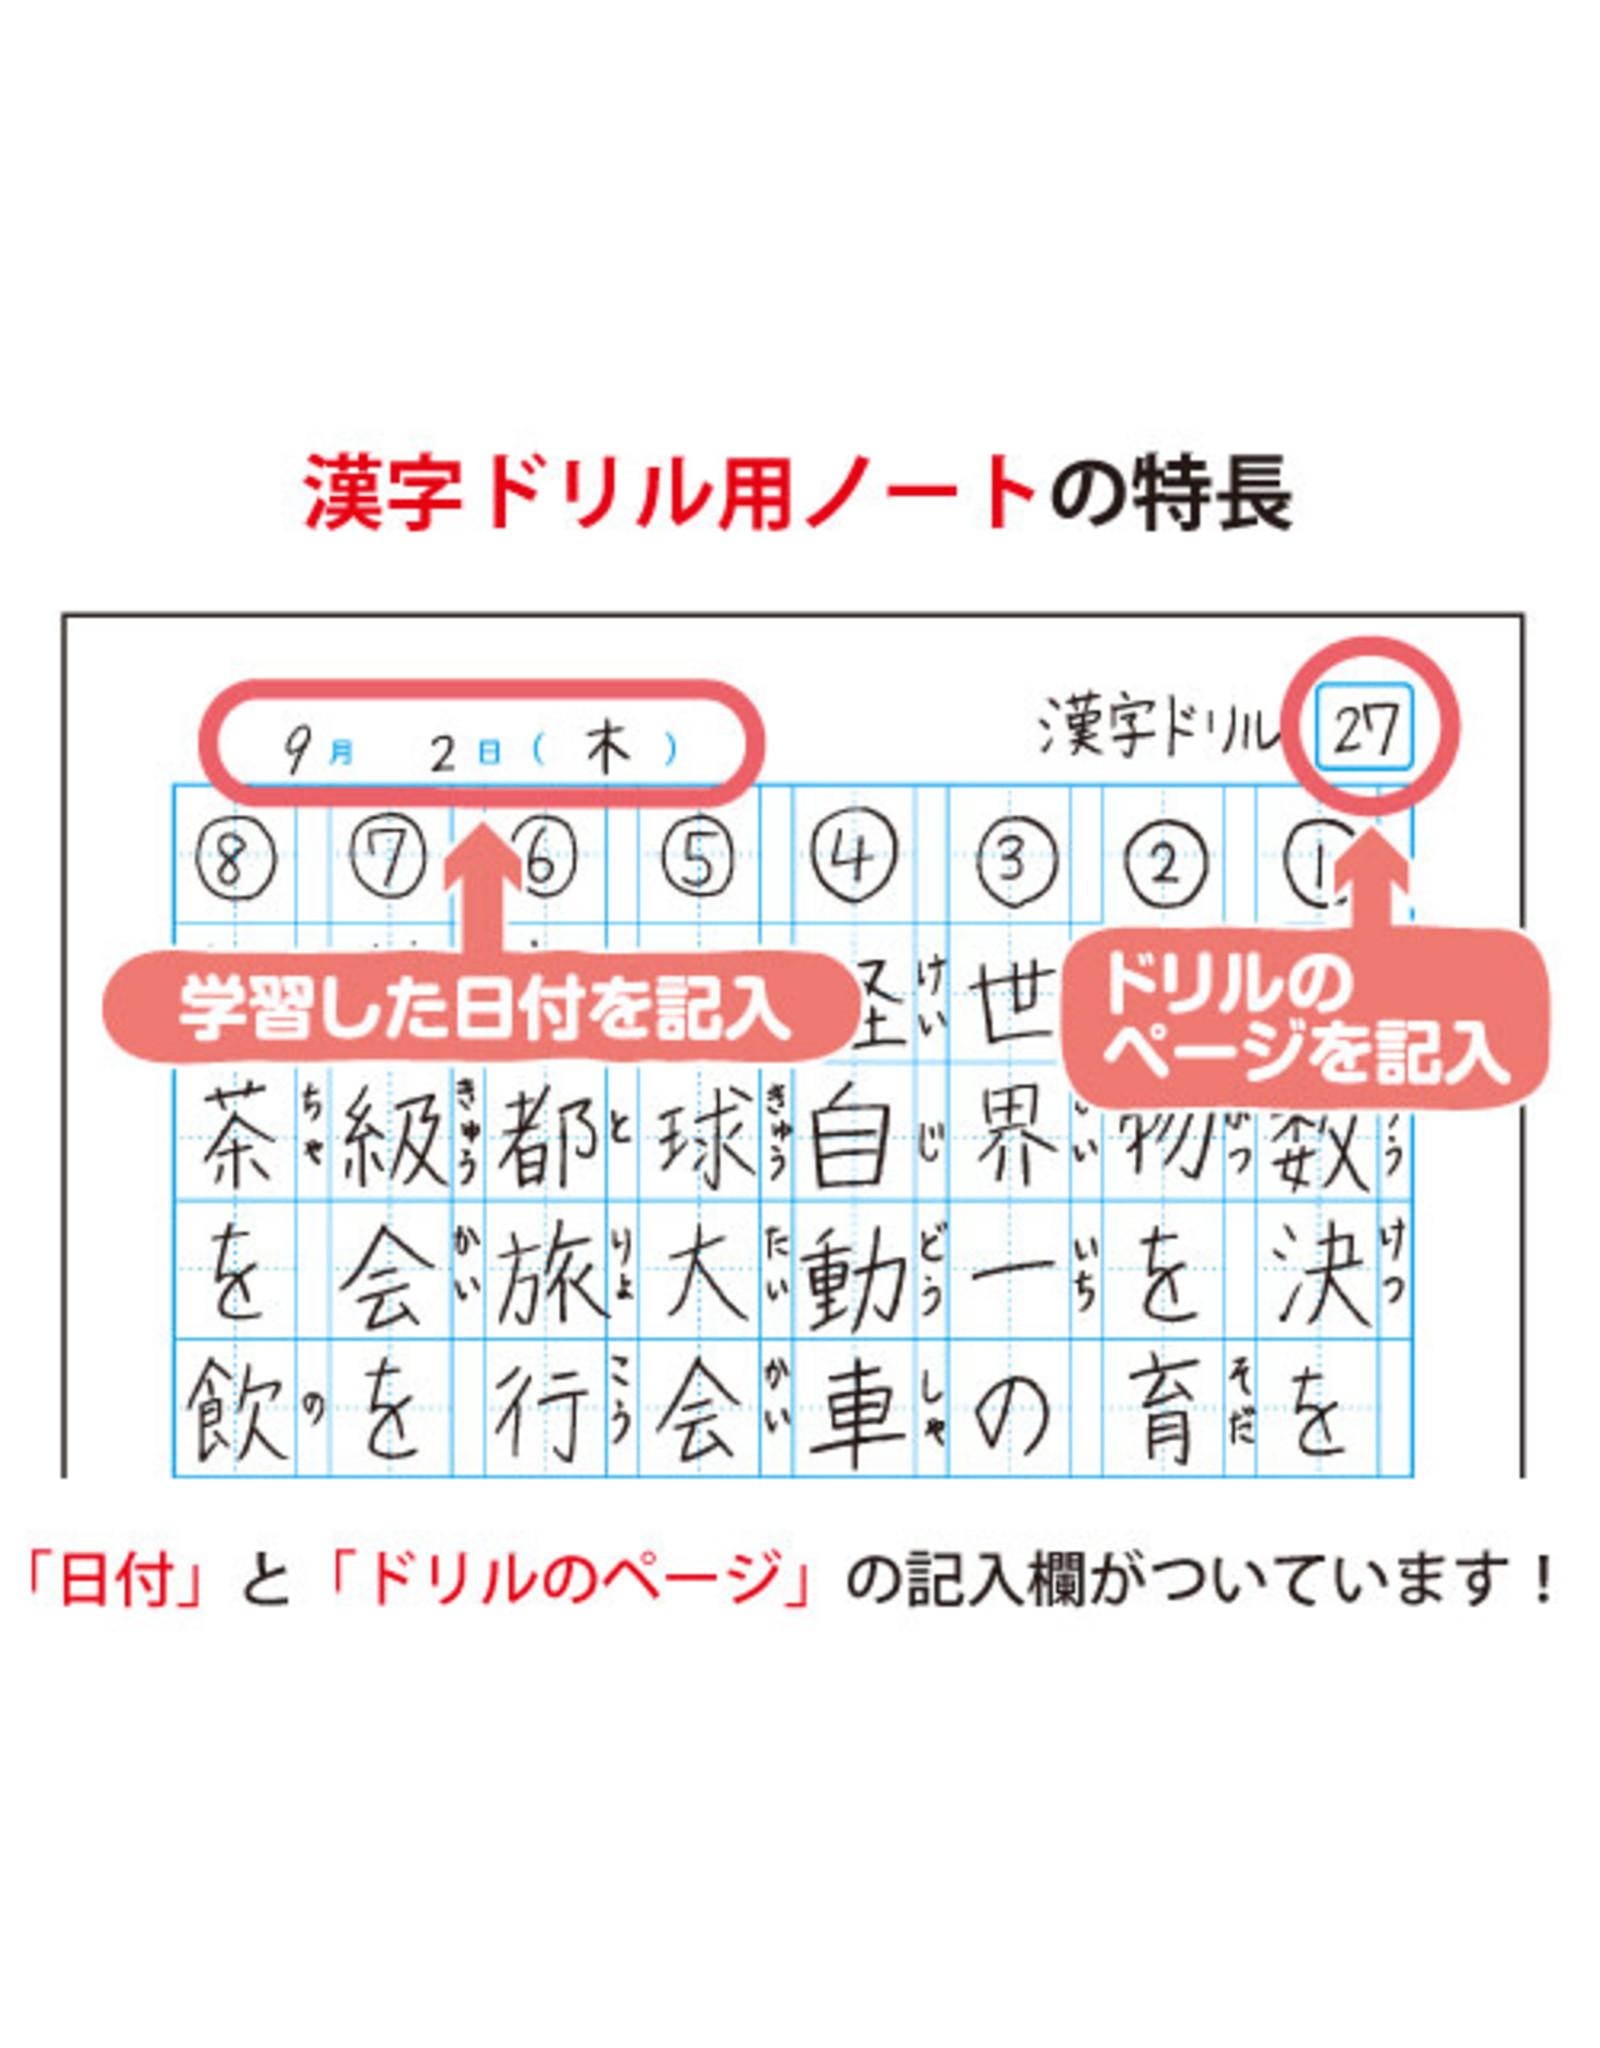 Kyokuto Associates co., ltd. KANJI DRILL NOTEBOOK 120 JI